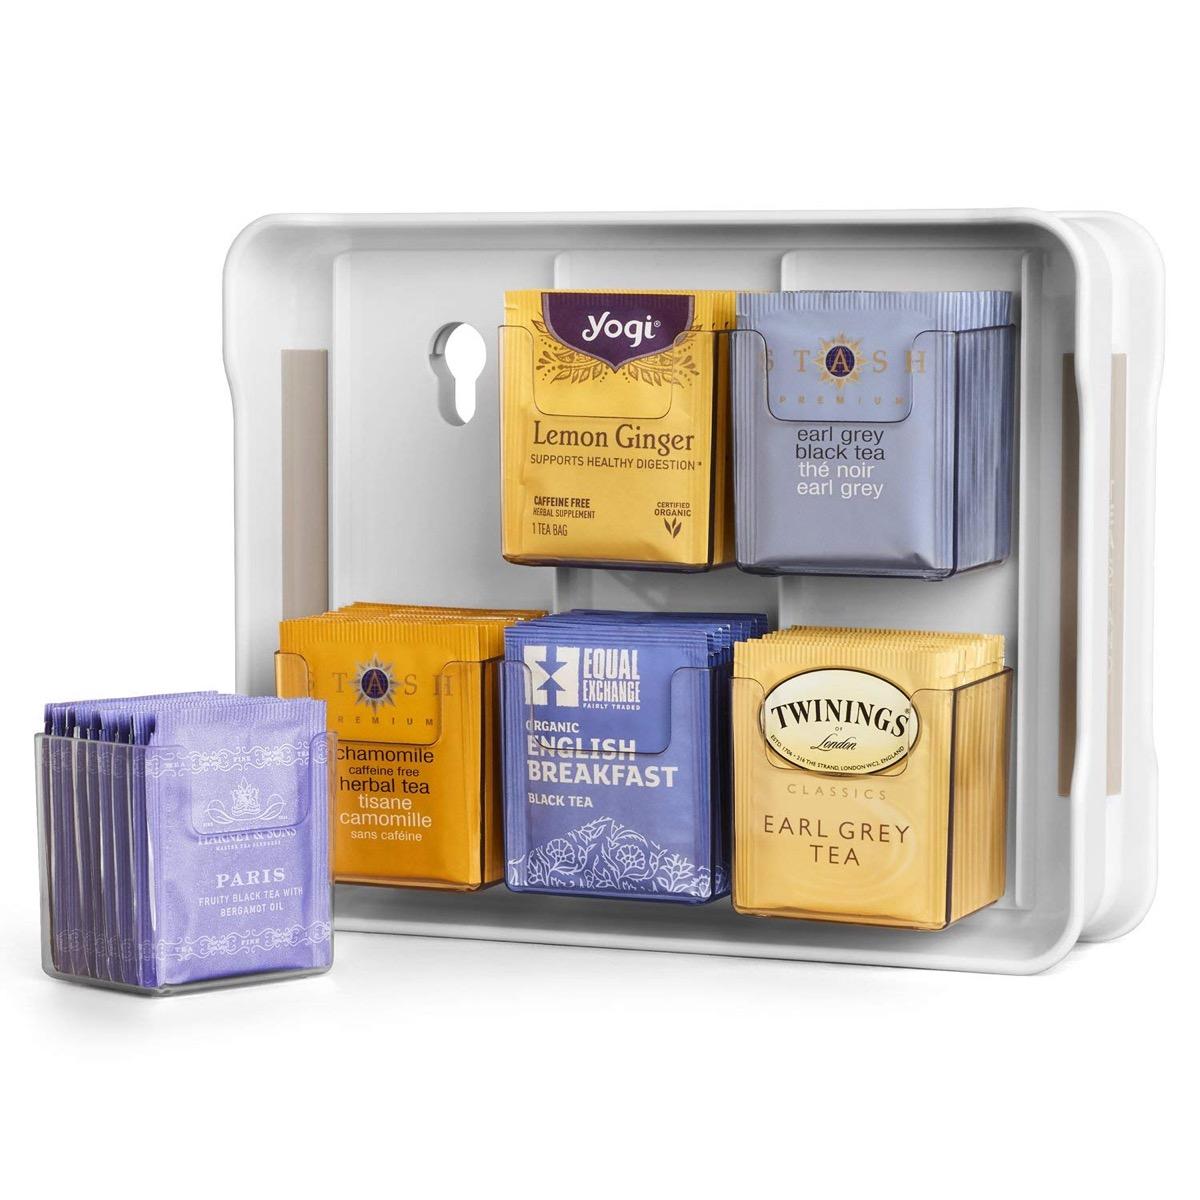 Tea Bag Organizer {Organizational Products on Amazon}